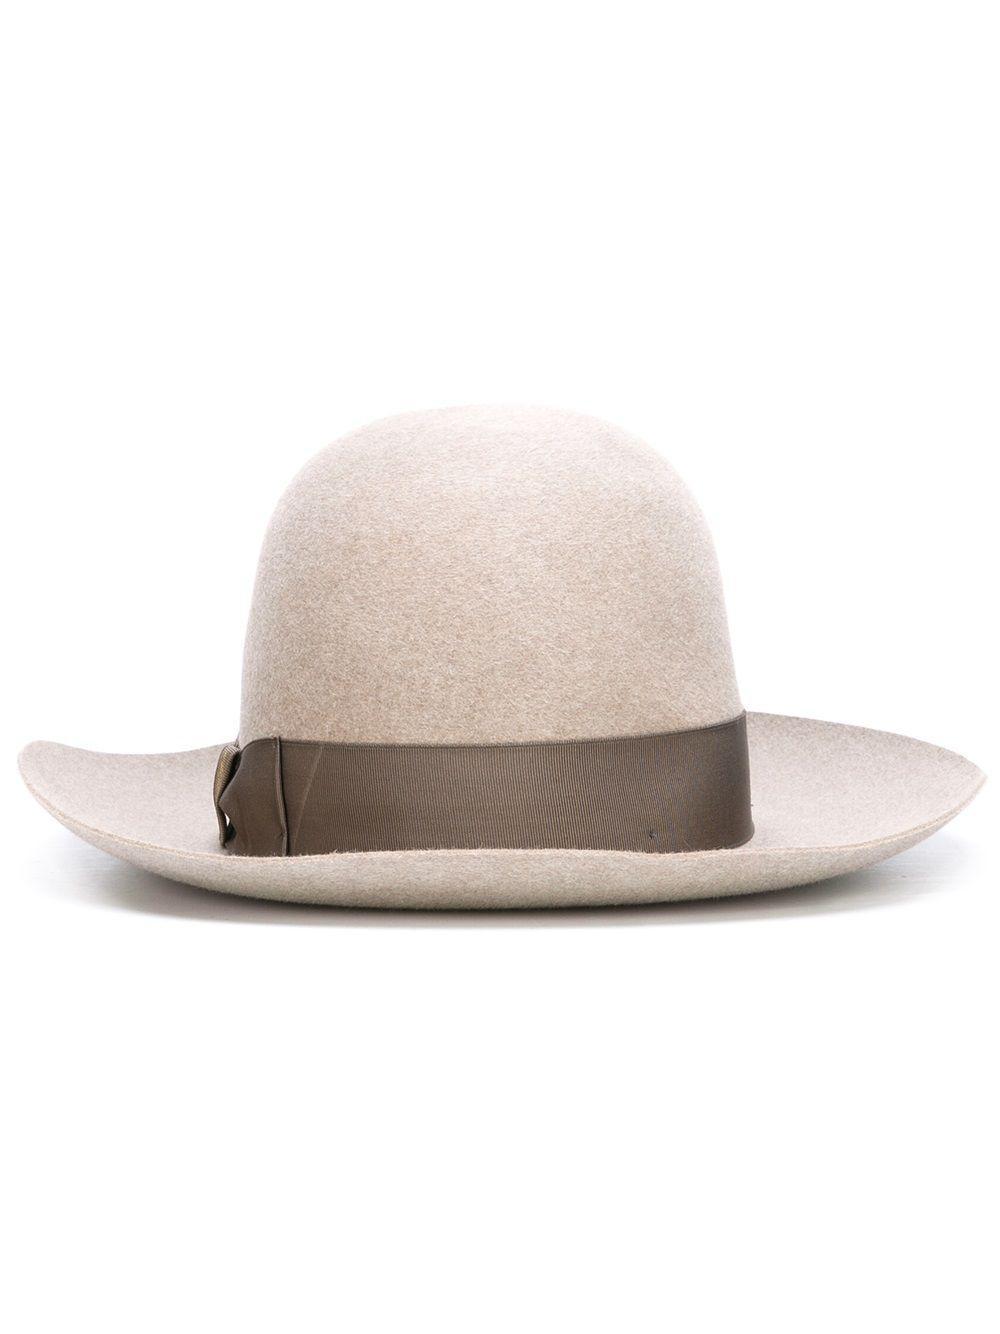 Lyst - Sombrero con lazo Borsalino de color Neutro c18640cfaef